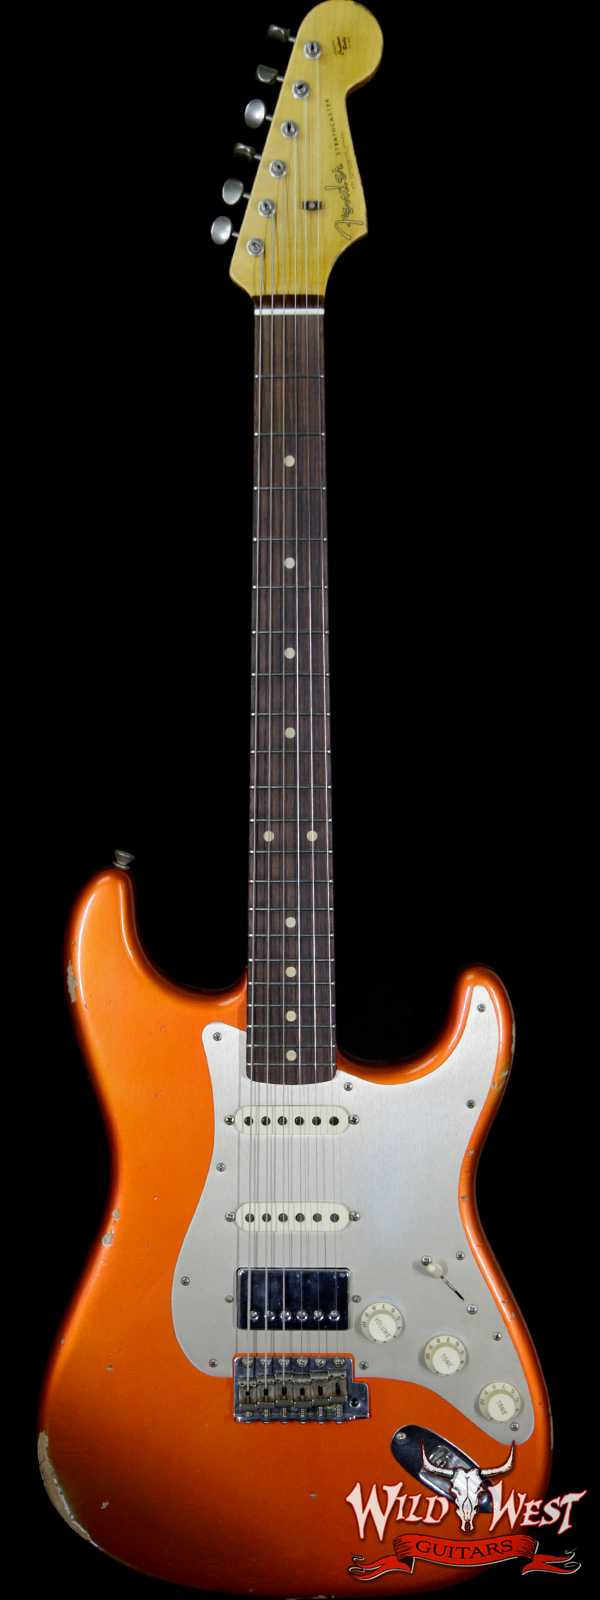 Fender Custom Shop 1962 Stratocaster Relic HSS EVH Bridge Pickup Rosewood Fingerboard Orange